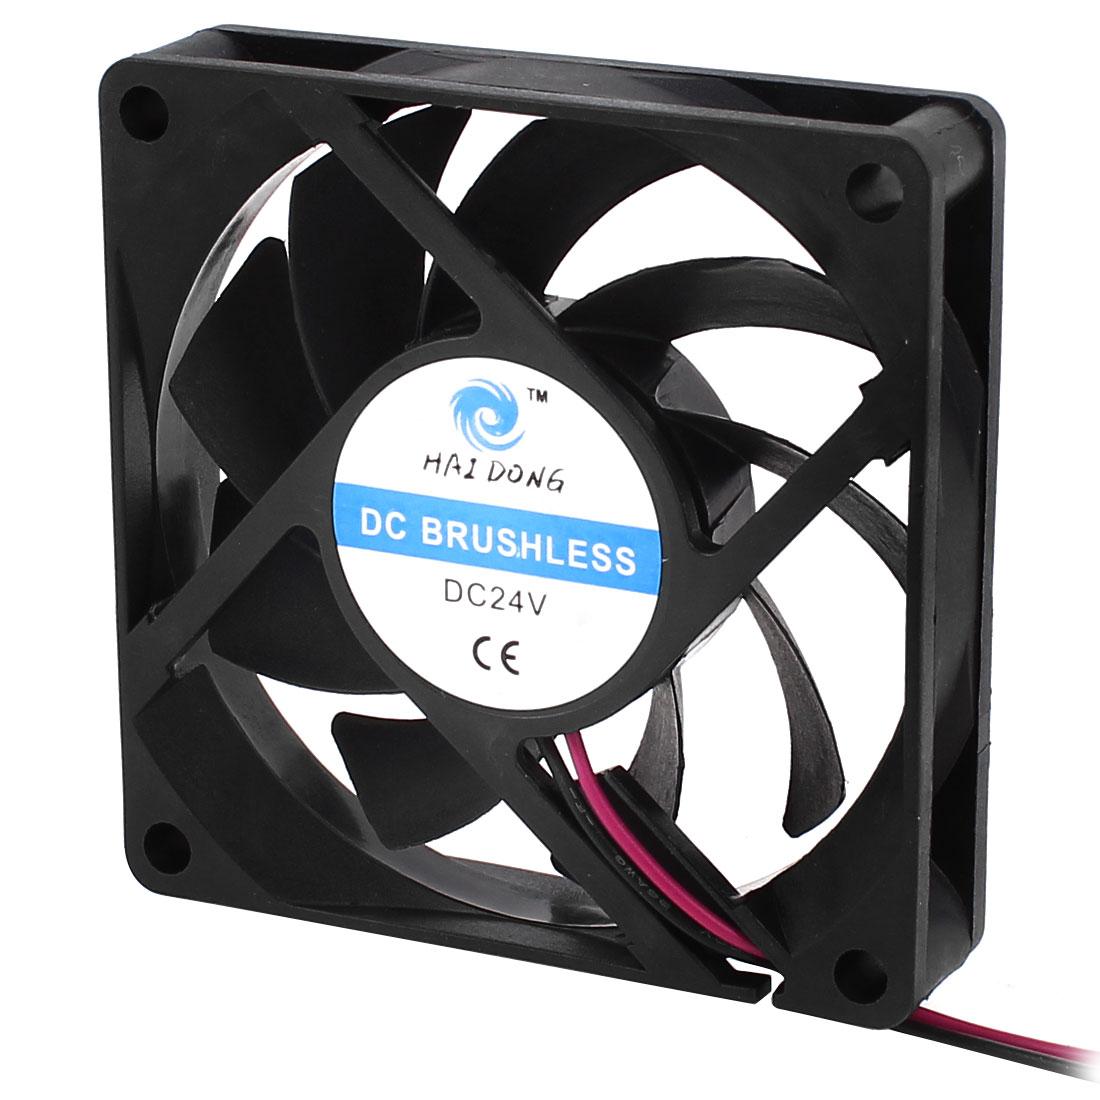 70mm x 15mm 7015 Brushless Cooling Fan DC 24V for Computer Case CPU Cooler